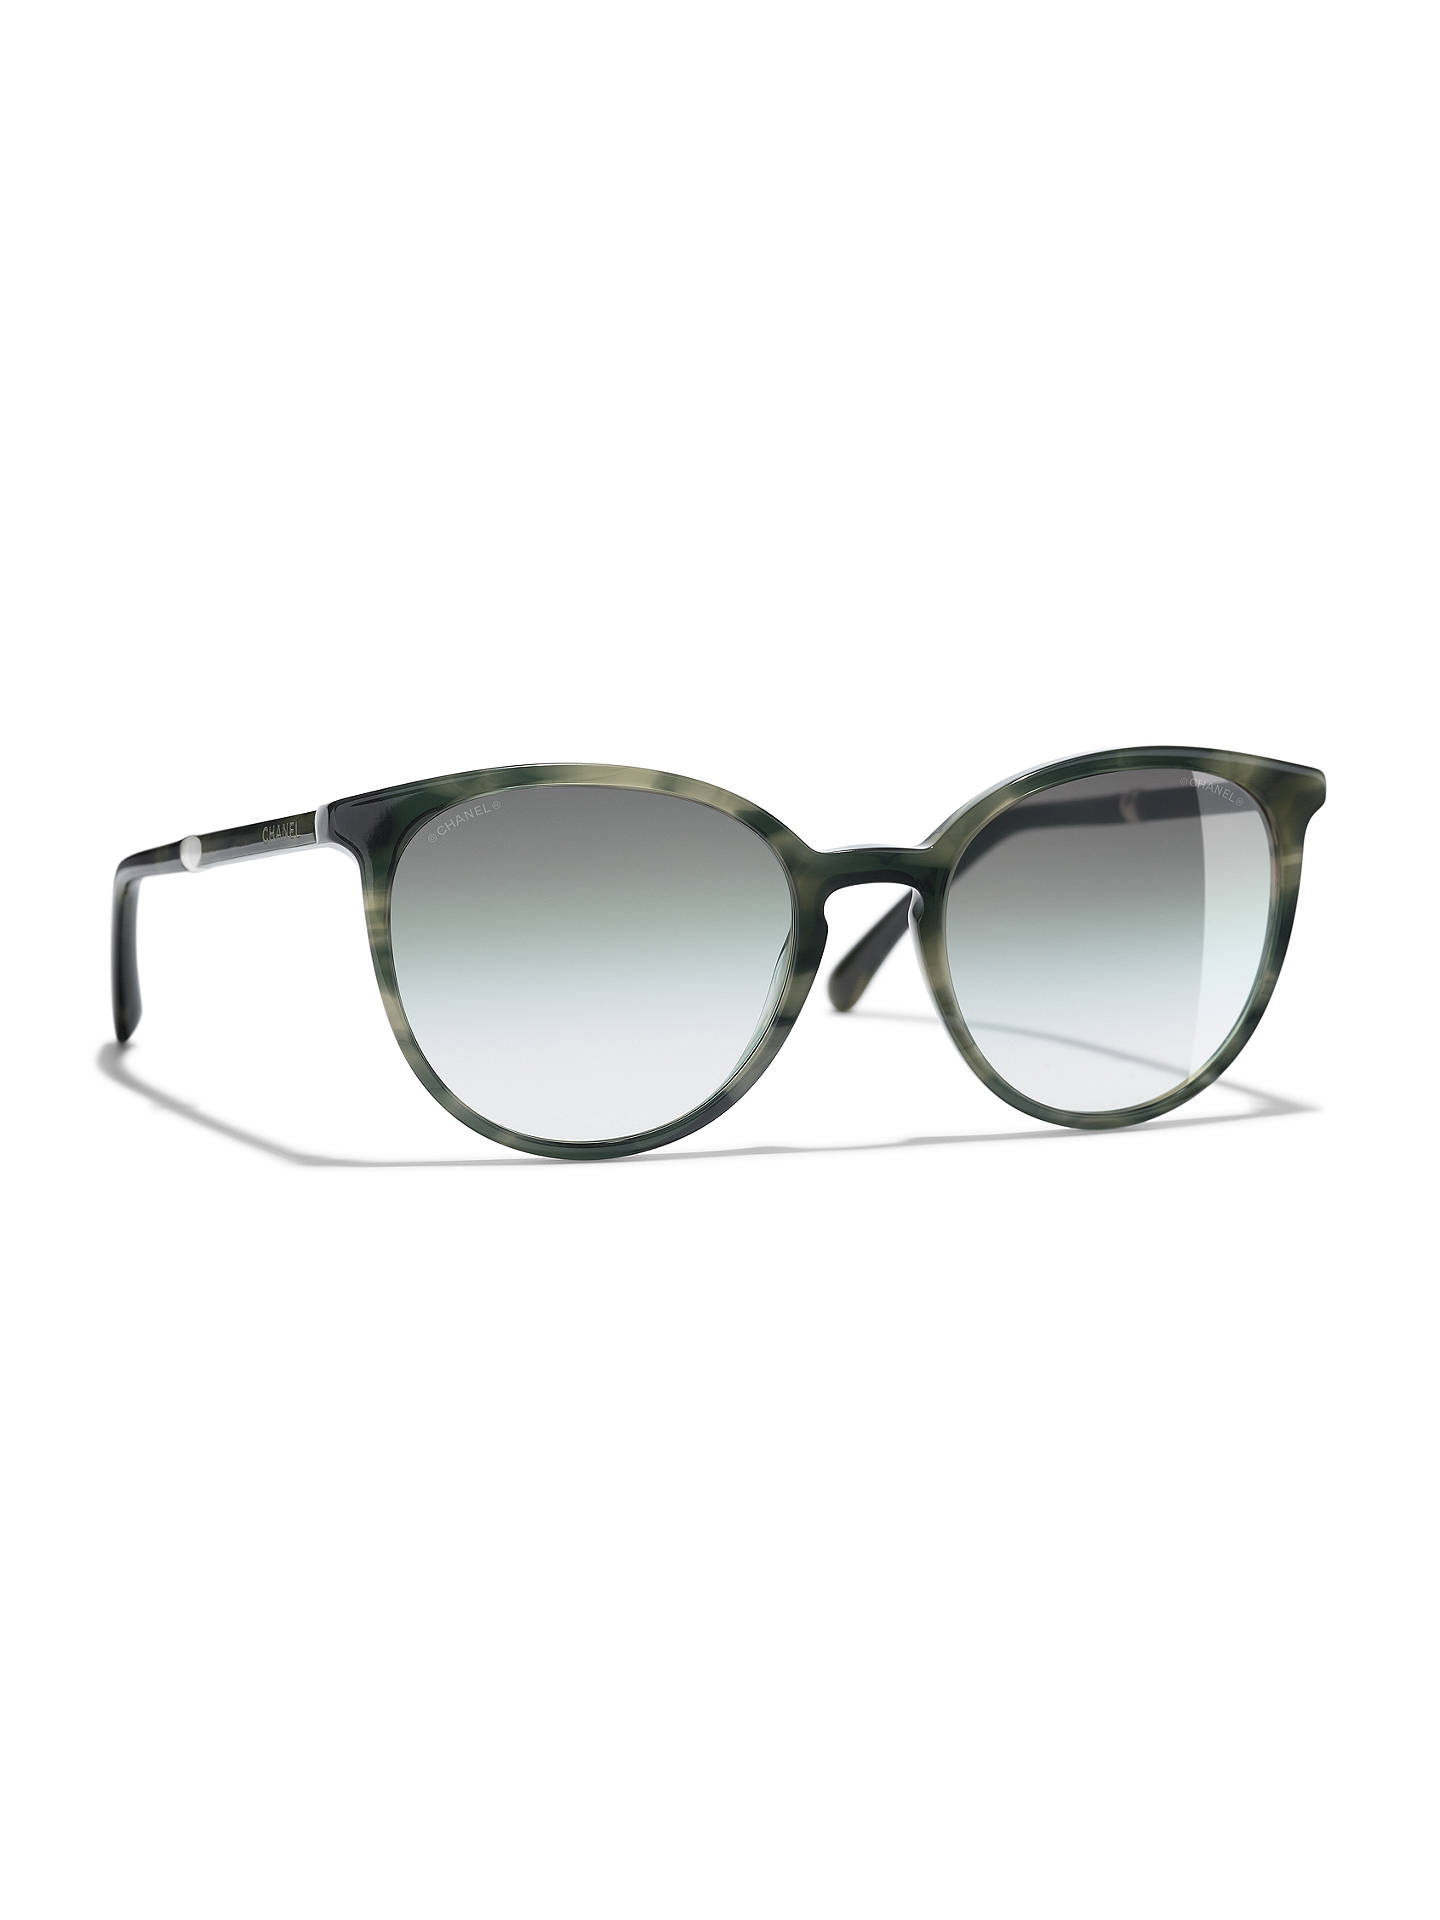 705d0ece8004 Buy CHANEL Pantos Sunglasses CH5394H Green Tortoise Online at johnlewis.com  ...